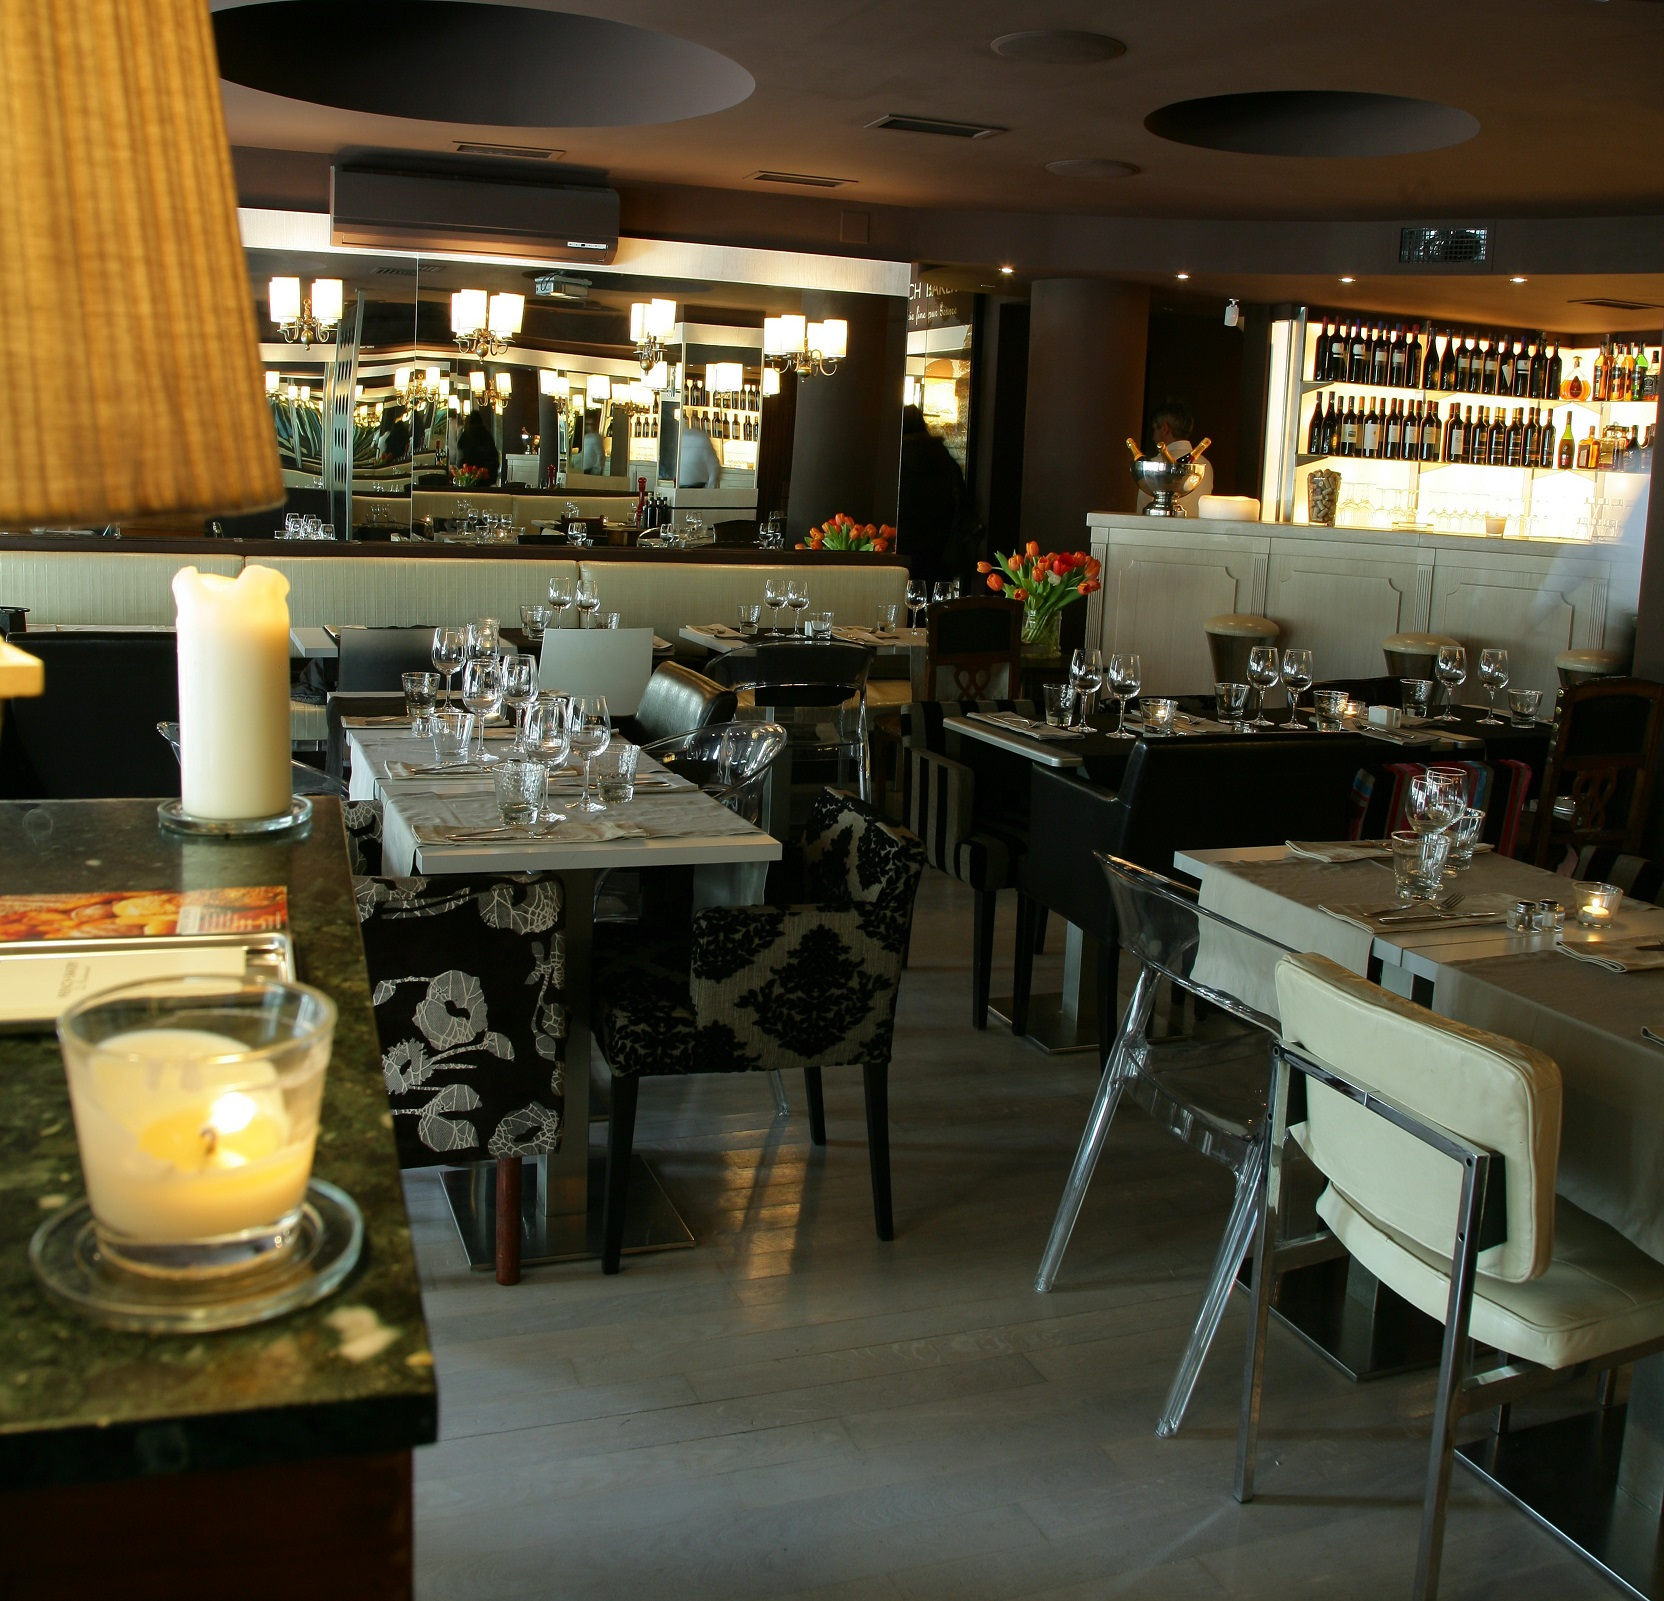 FRENCH BAKERY Le Restaurant 1